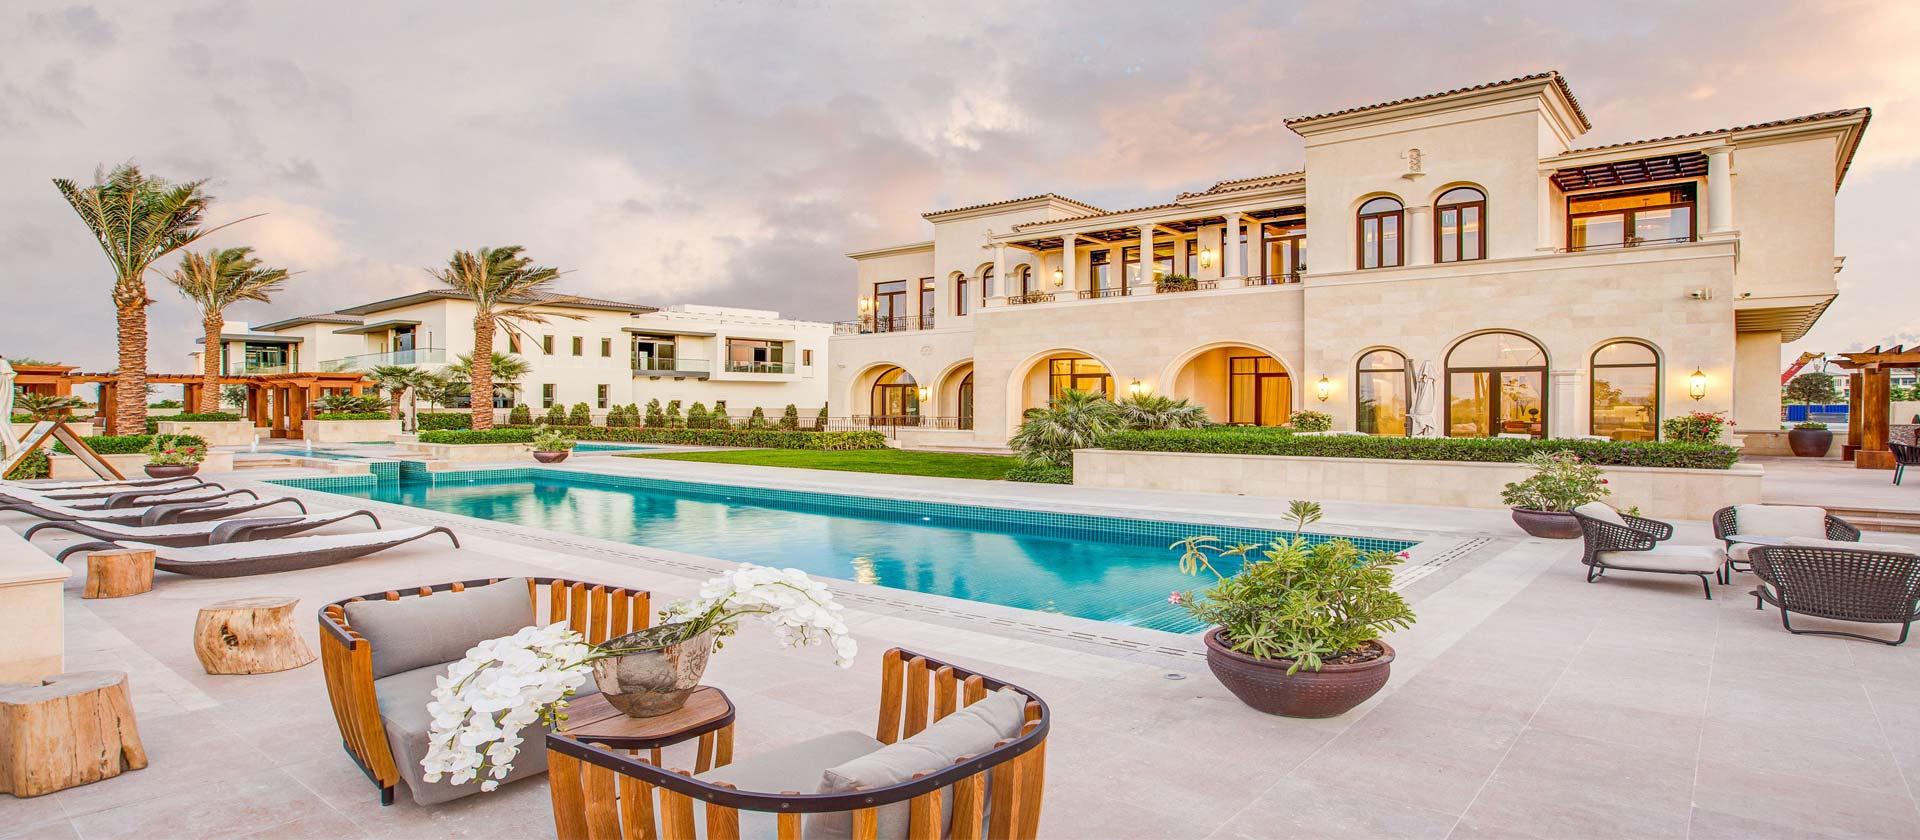 Dubai Hills Grove and Villas